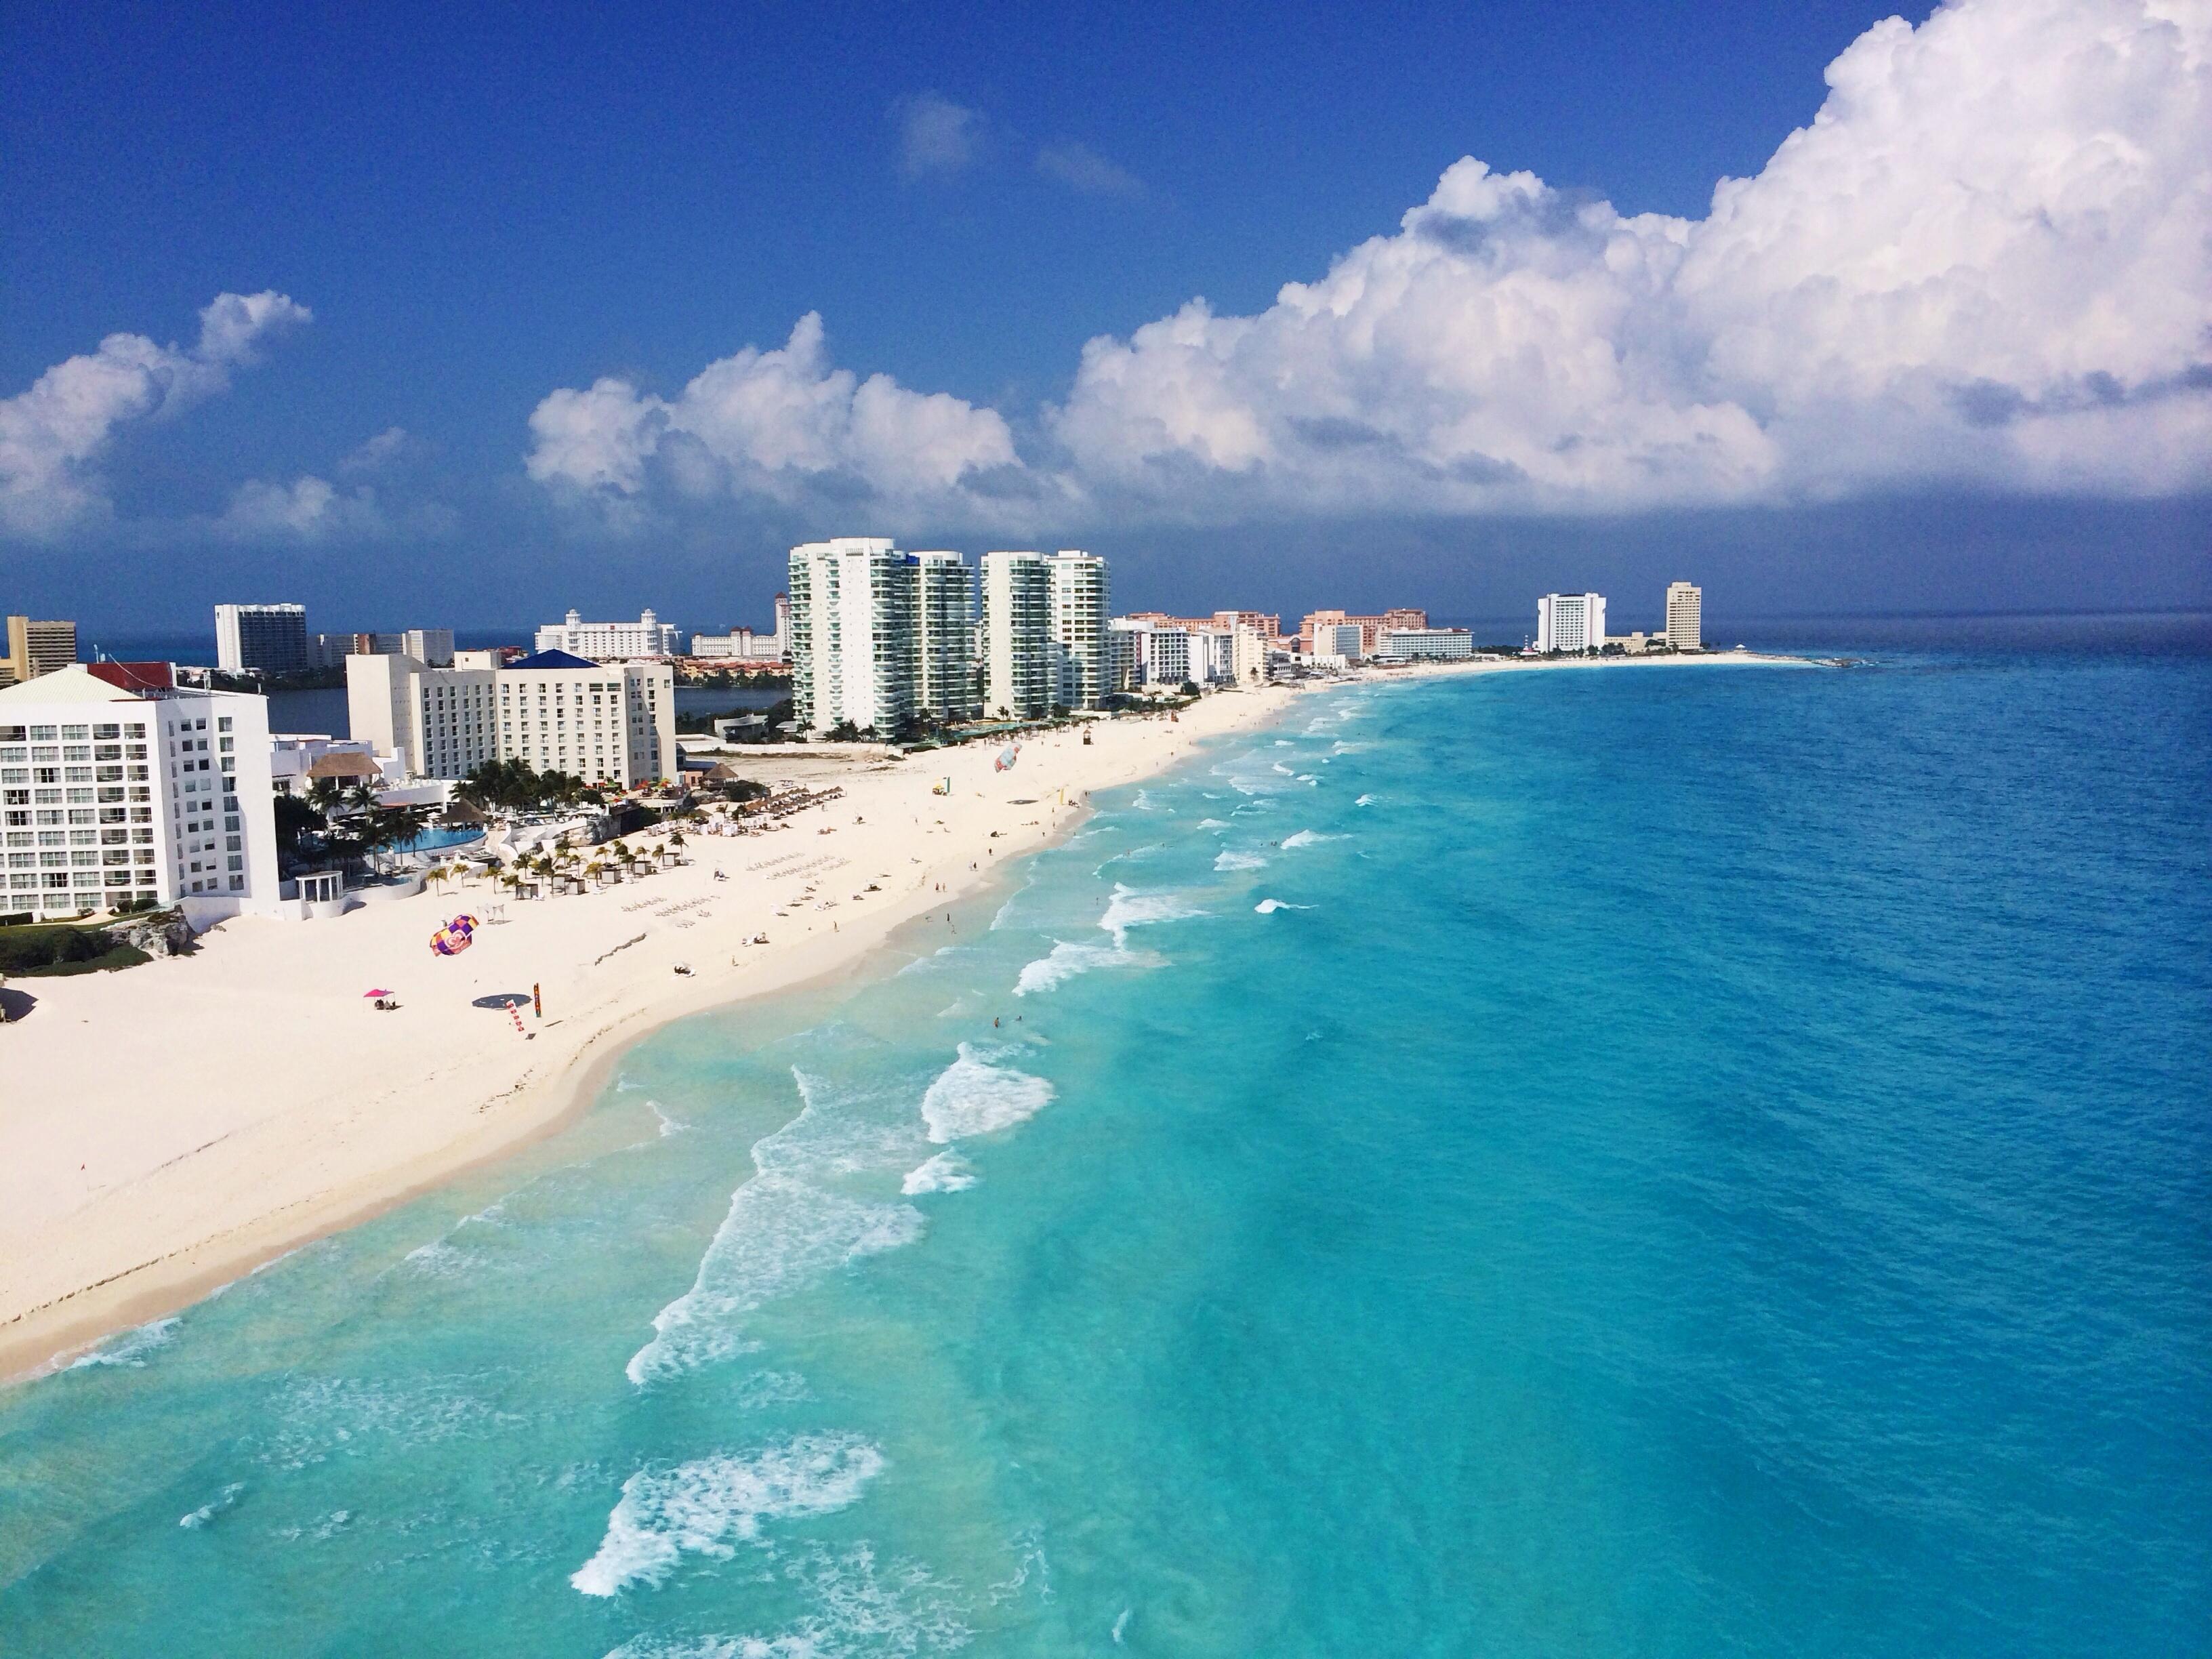 Cancun Mexico Amazing Tourists Destination Found The World